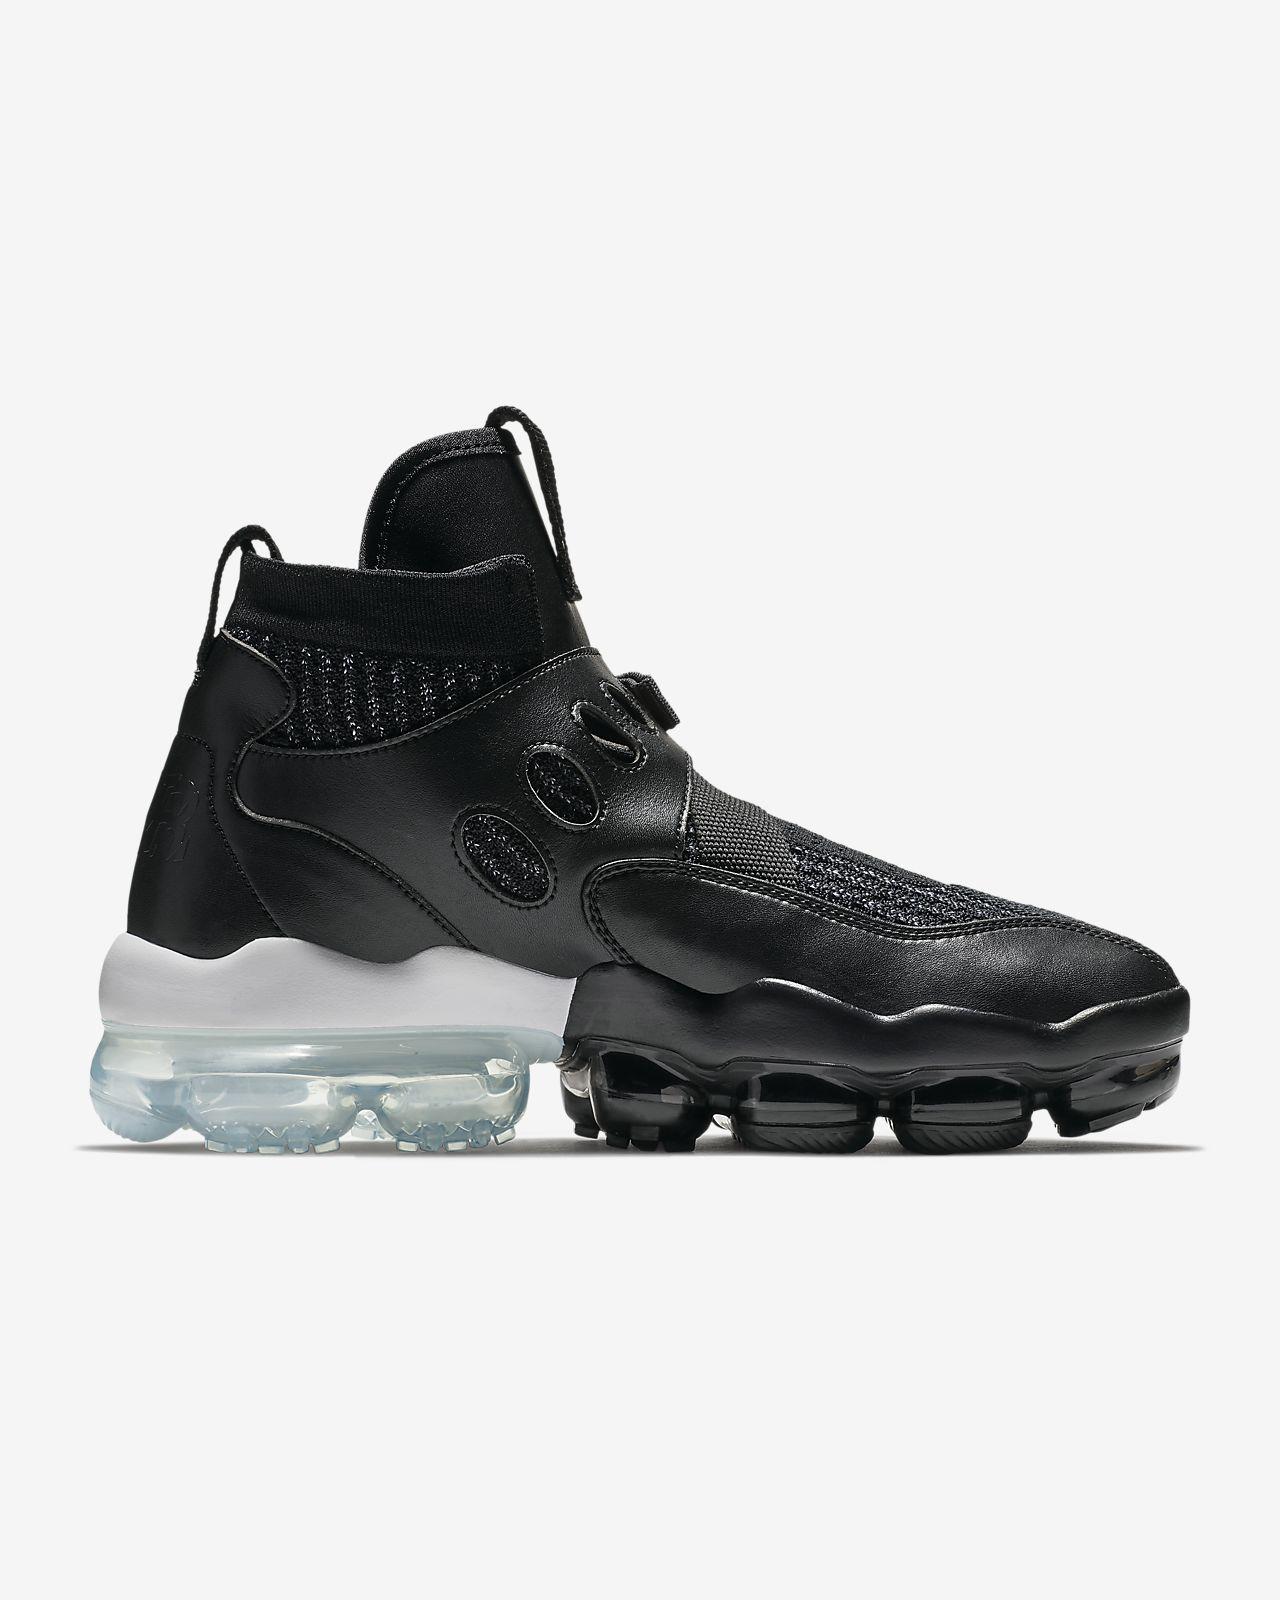 a993ca9b379 Nike Air VaporMax Premier Flyknit Men s Shoe. Nike.com GB